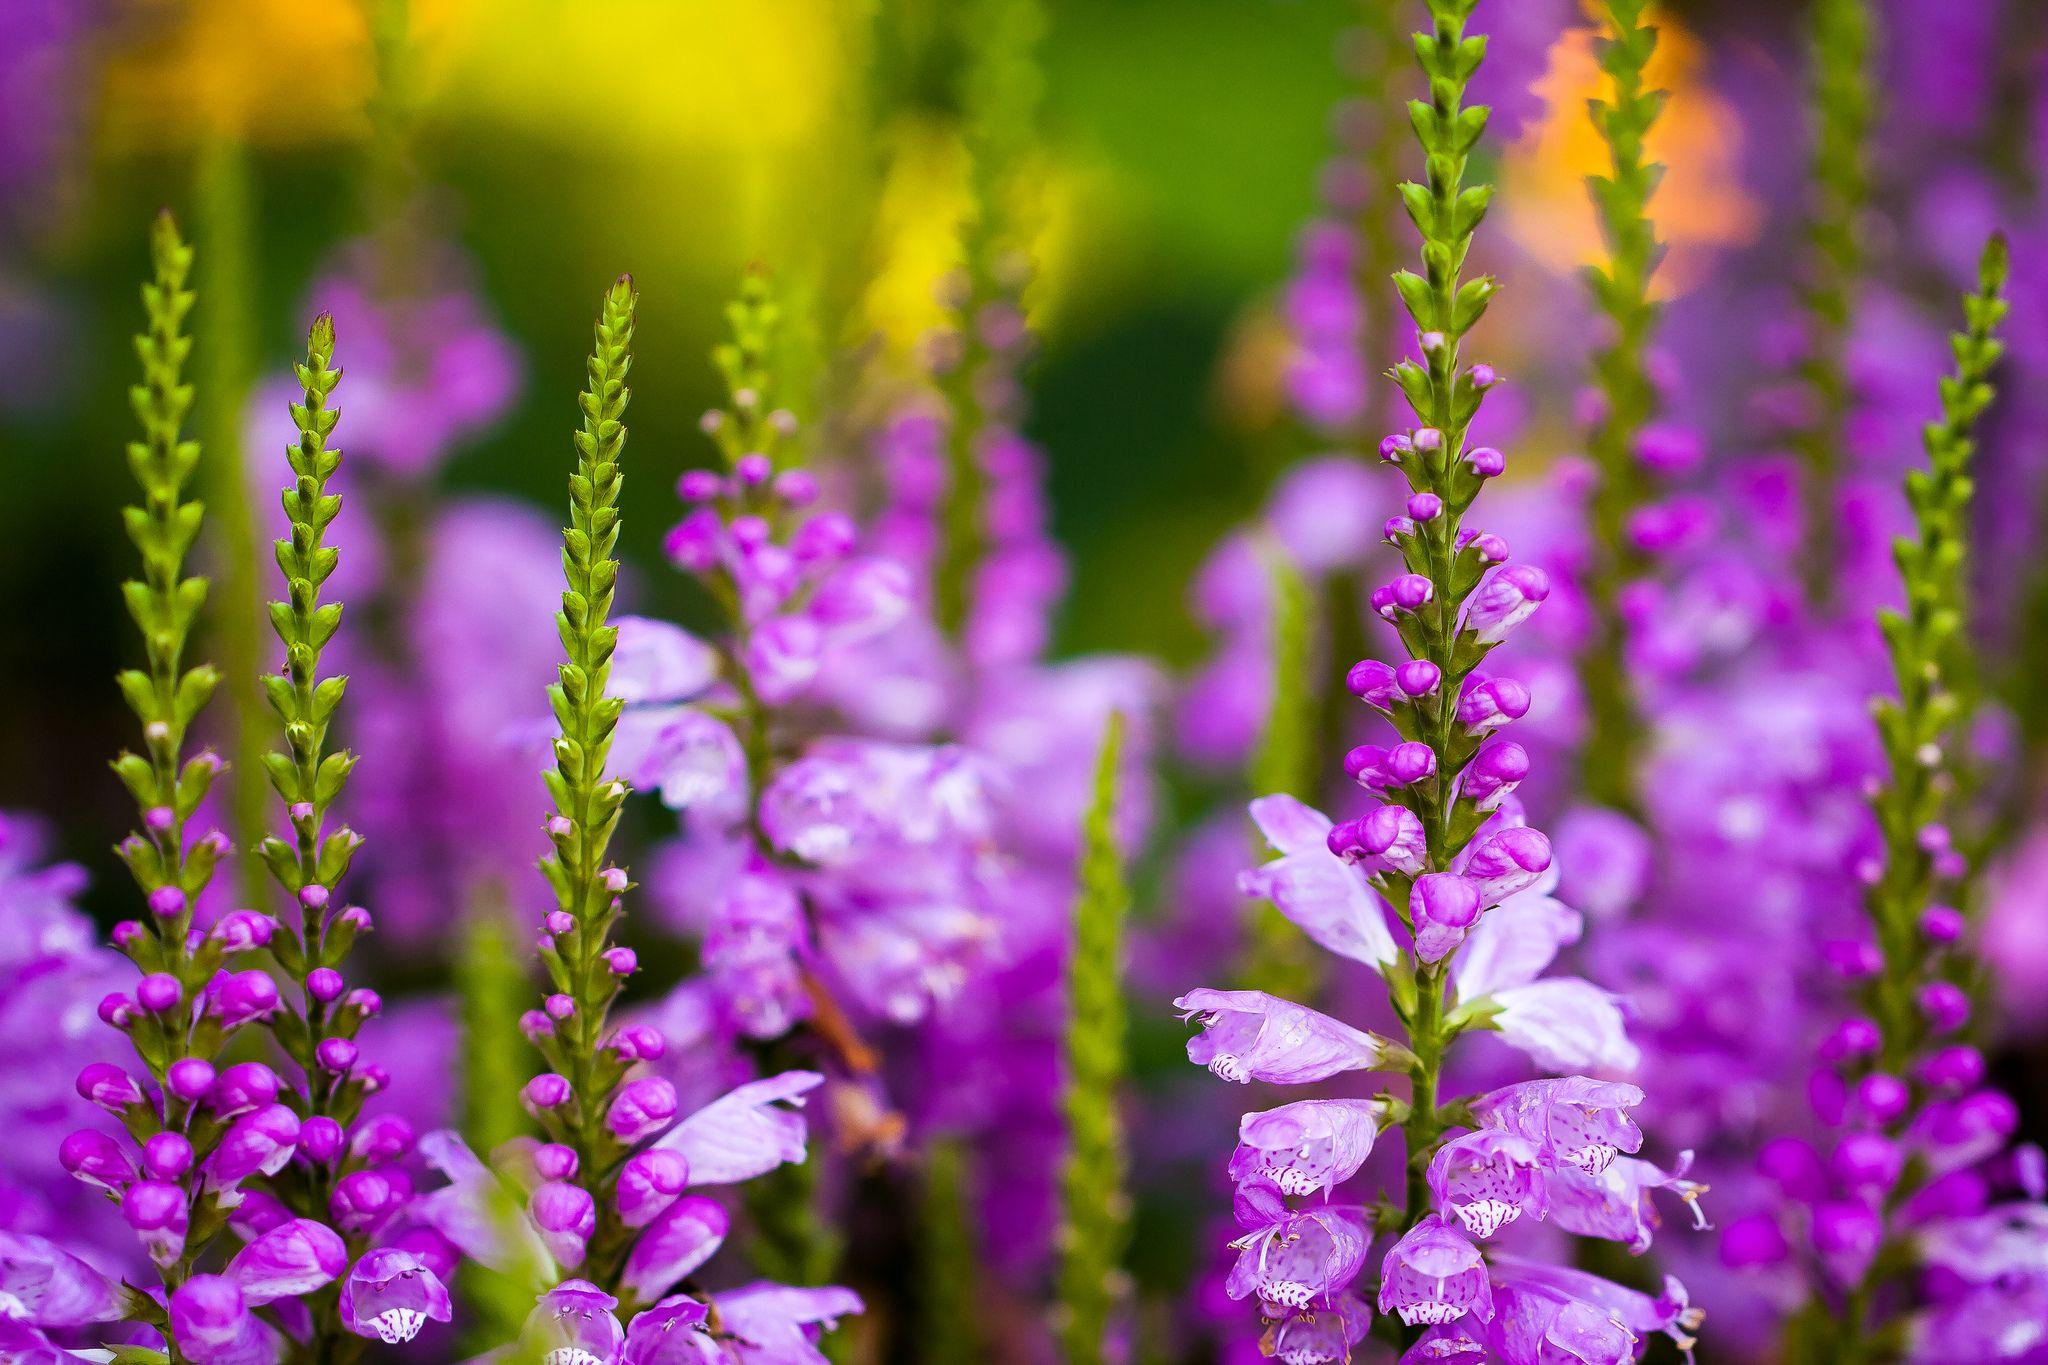 https://flic.kr/p/dRKYdm   Purple larkspur   Taken at Chicago Botanic Garden